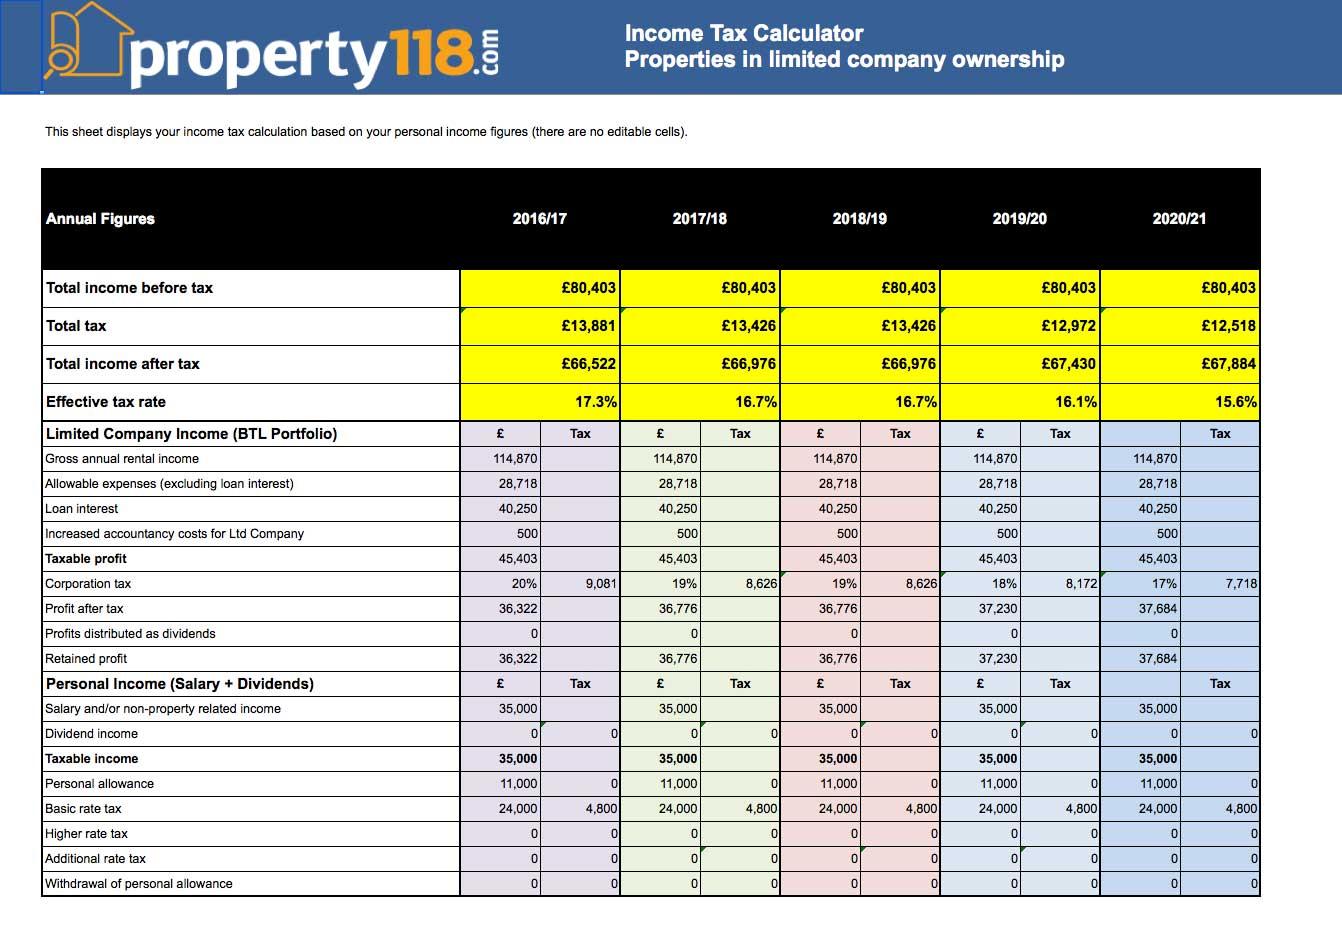 Landlord Spreadsheet As Free Spreadsheet Blank Spreadsheet   Daykem For Landlord Spreadsheet Free